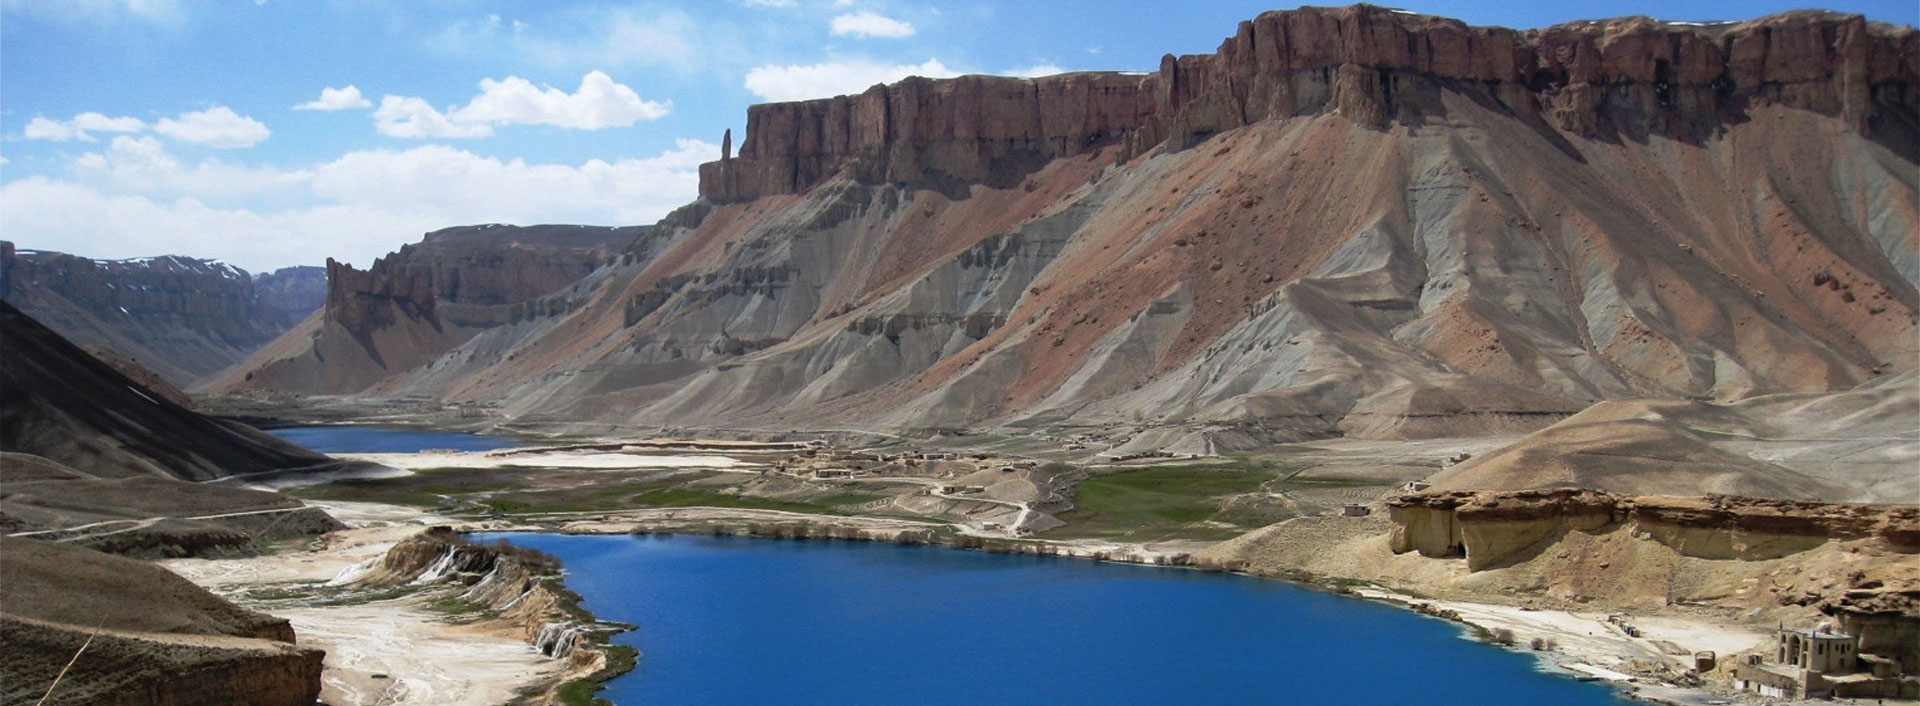 Band-eAmir-lakes-Afghanistan-3-1920x706